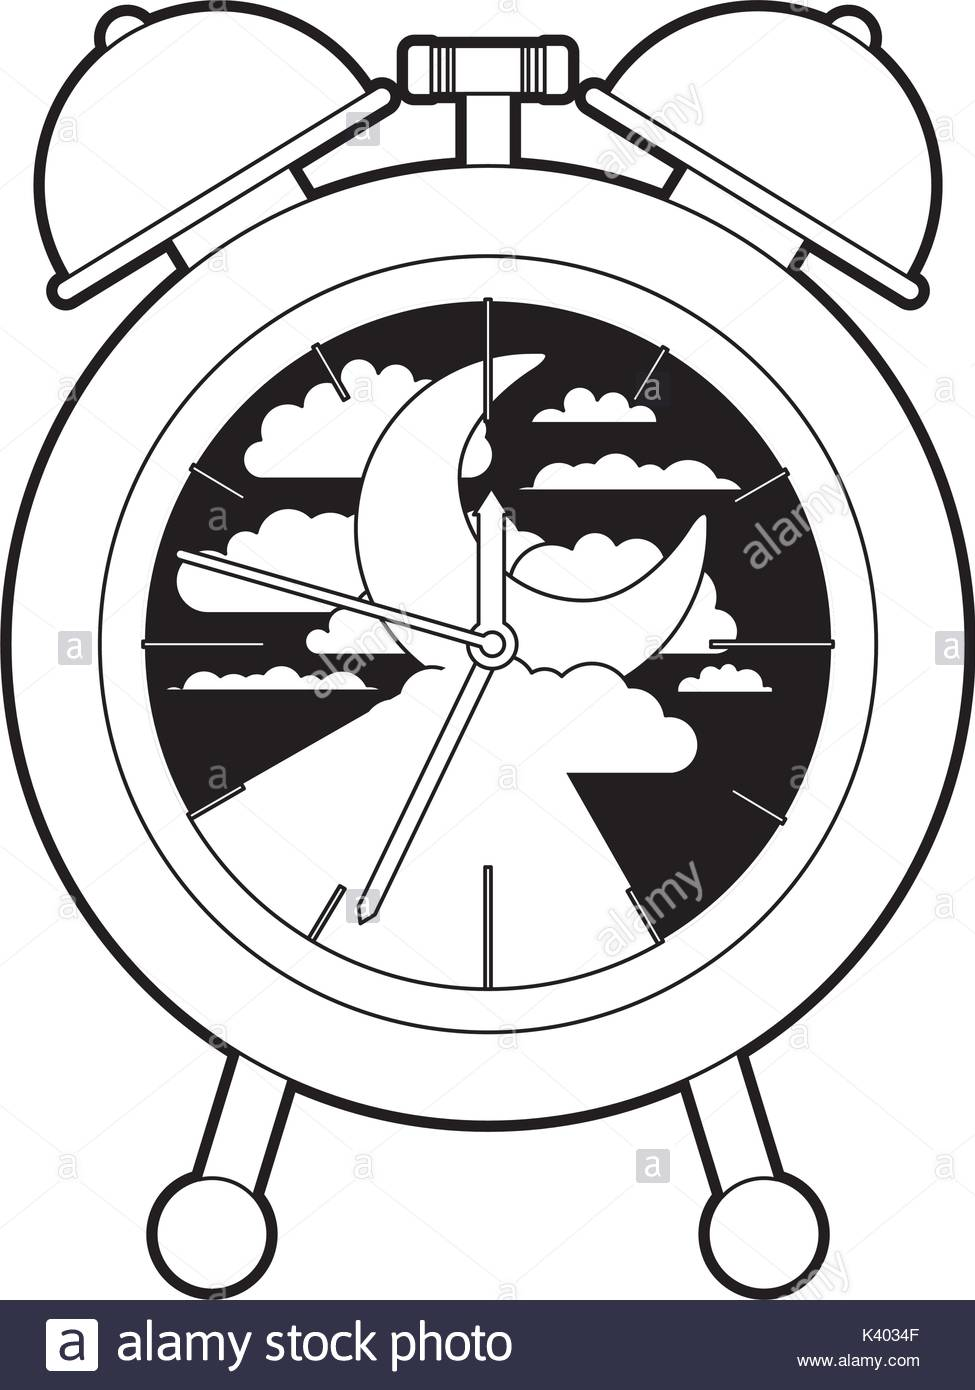 975x1390 Alarm Clock With Night Moon Landscape Inside Decorative Black